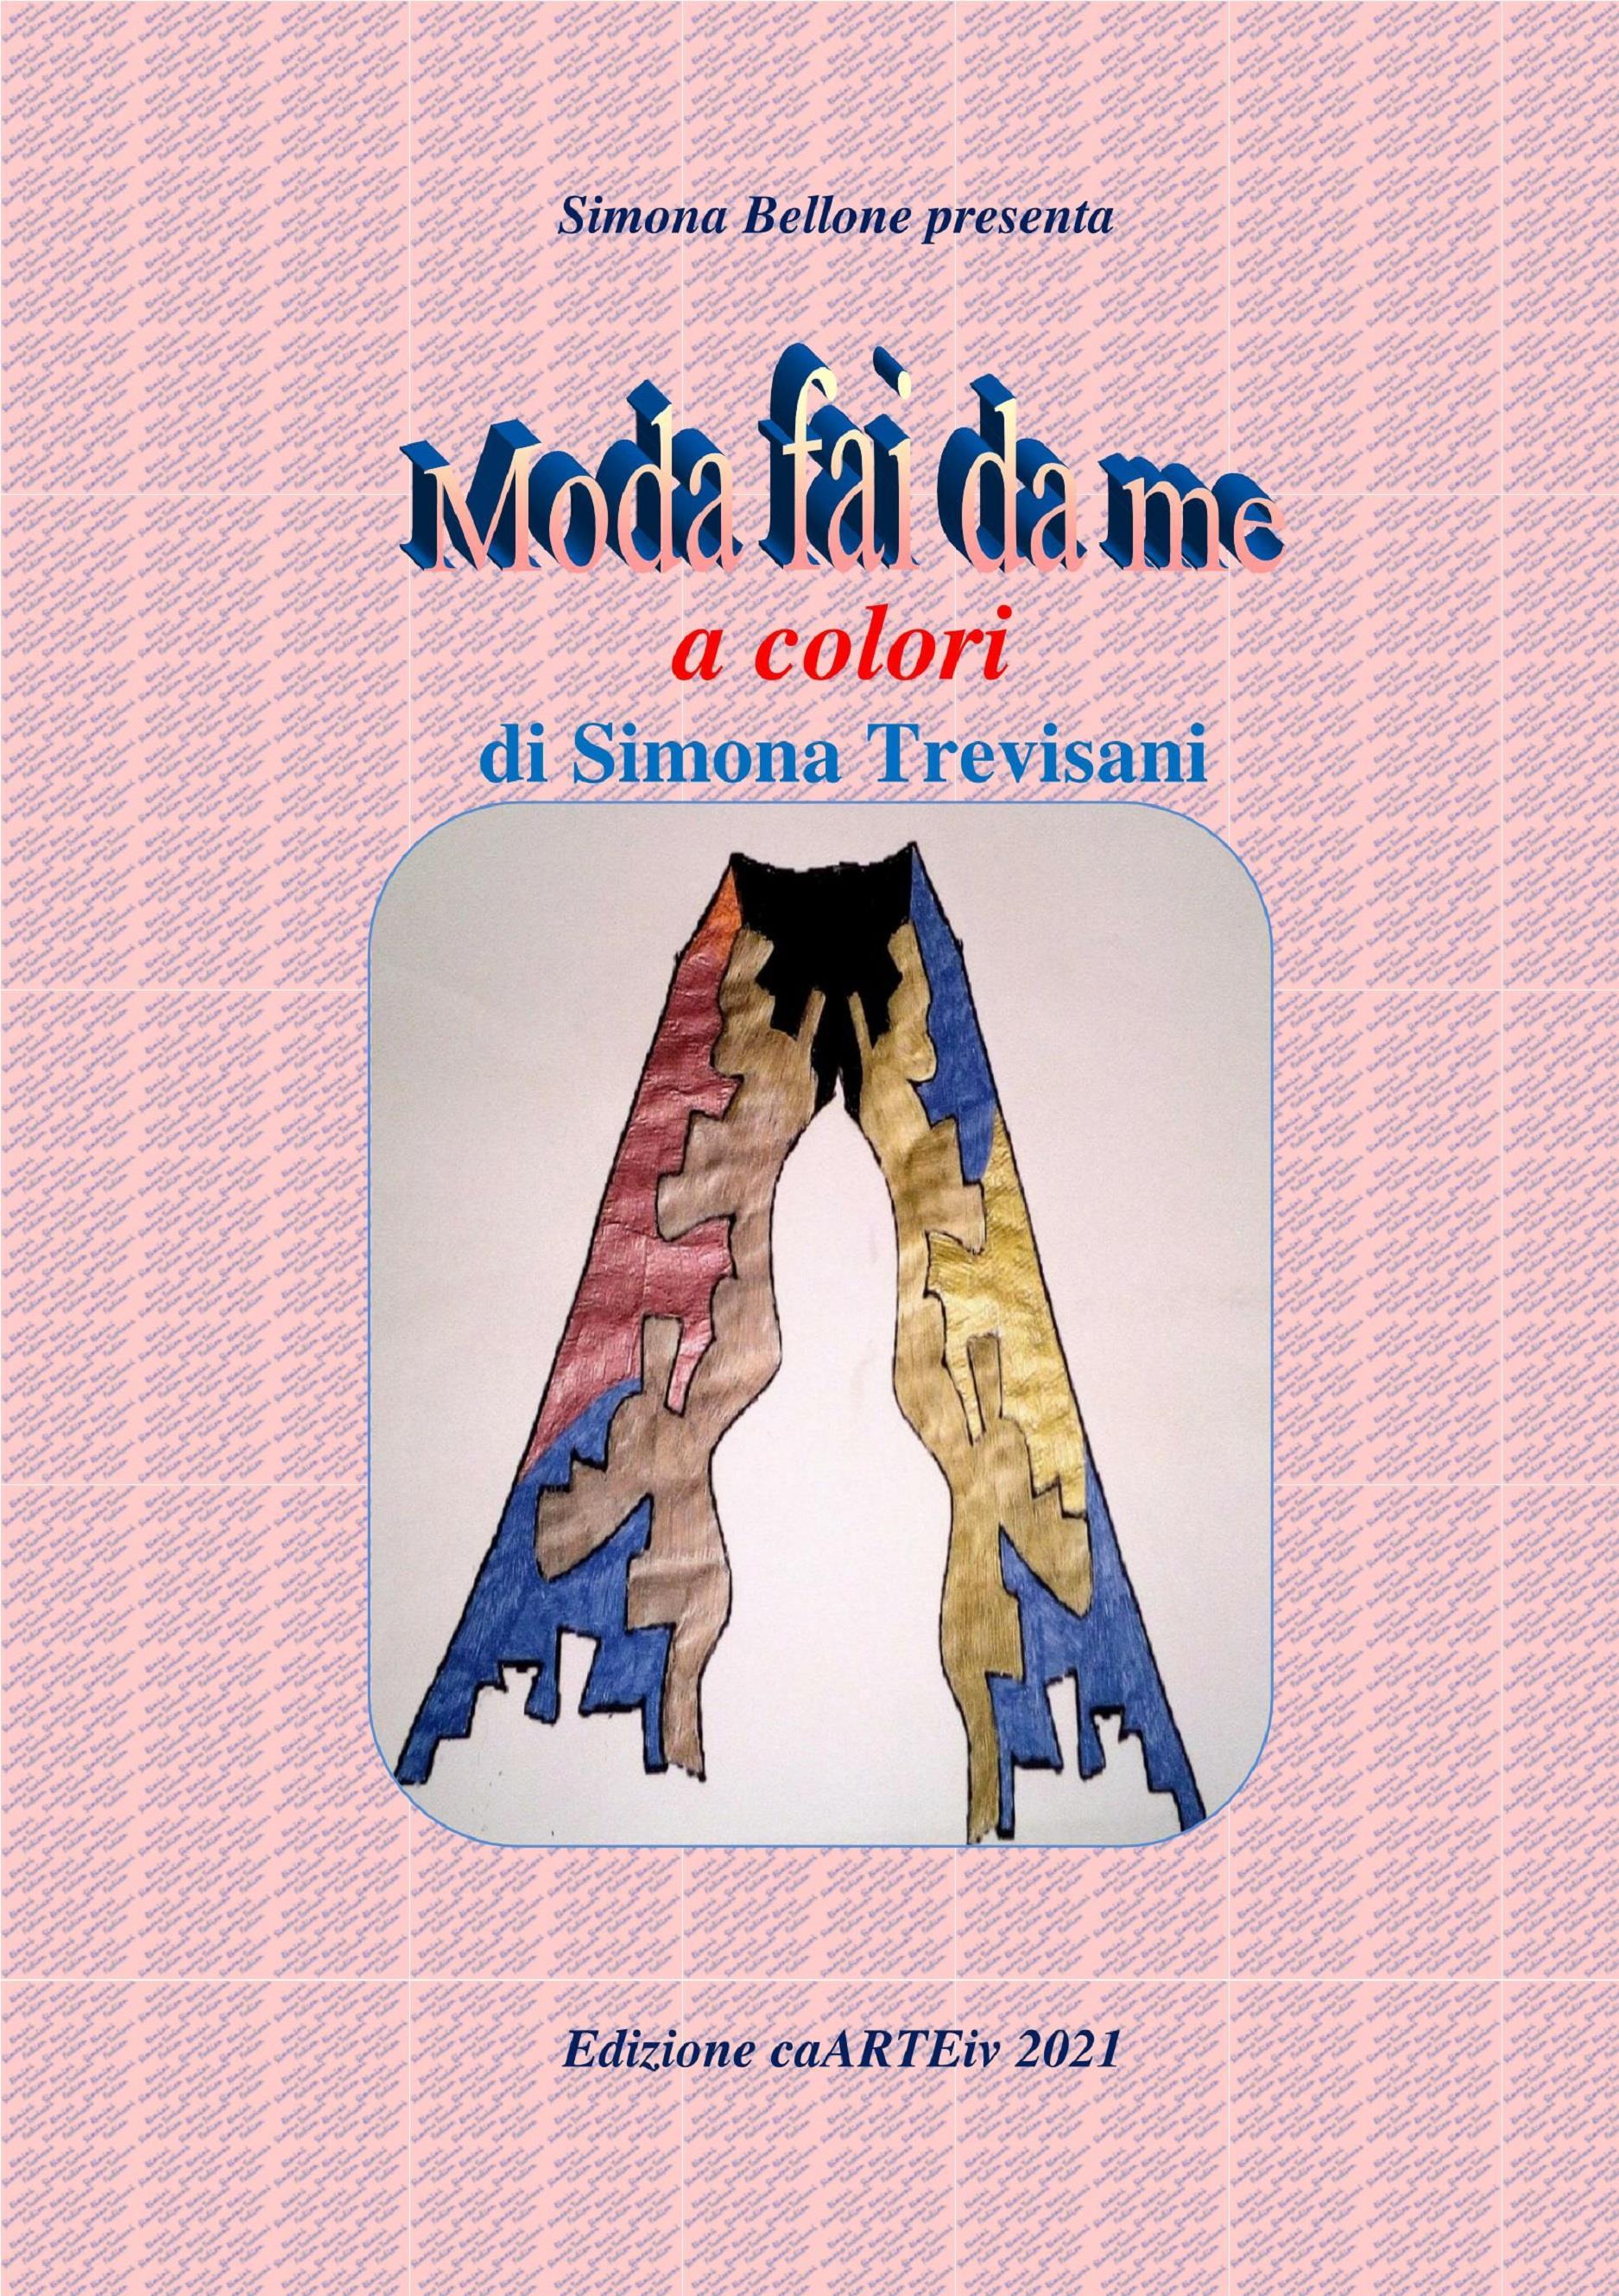 Moda fai da me a colori di Simona Trevisani